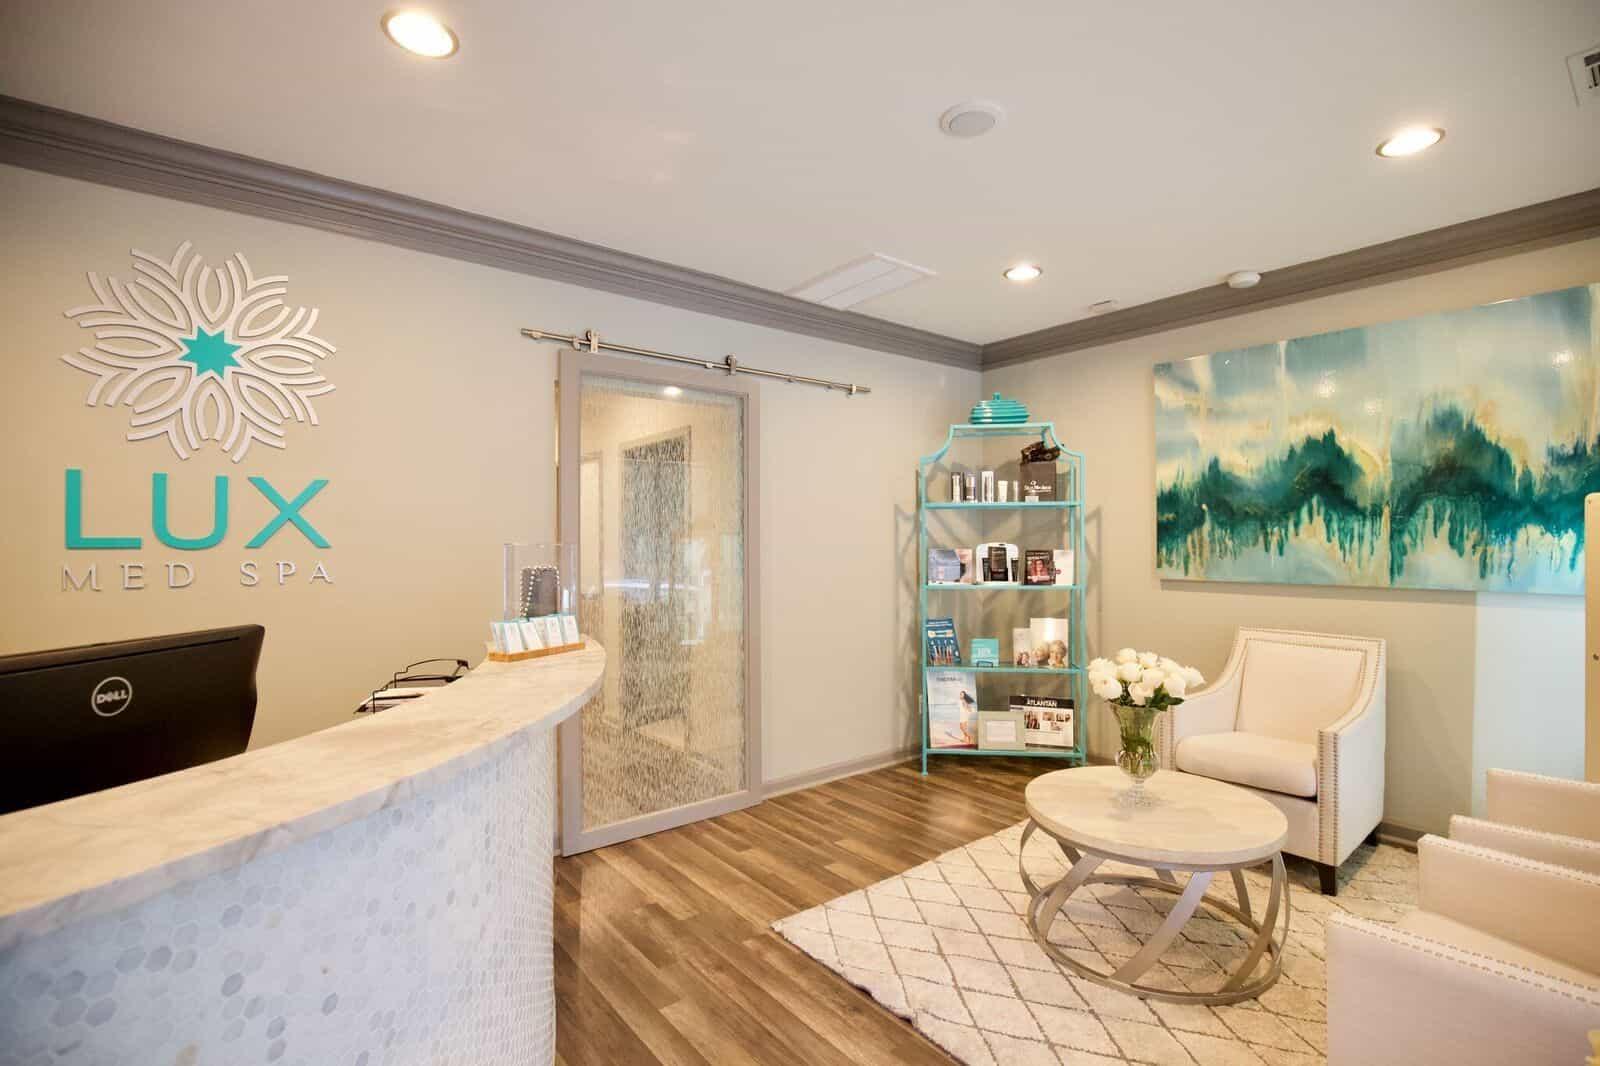 Lux Med Spa | Buckhead Plastic Surgery in Atlanta, GA